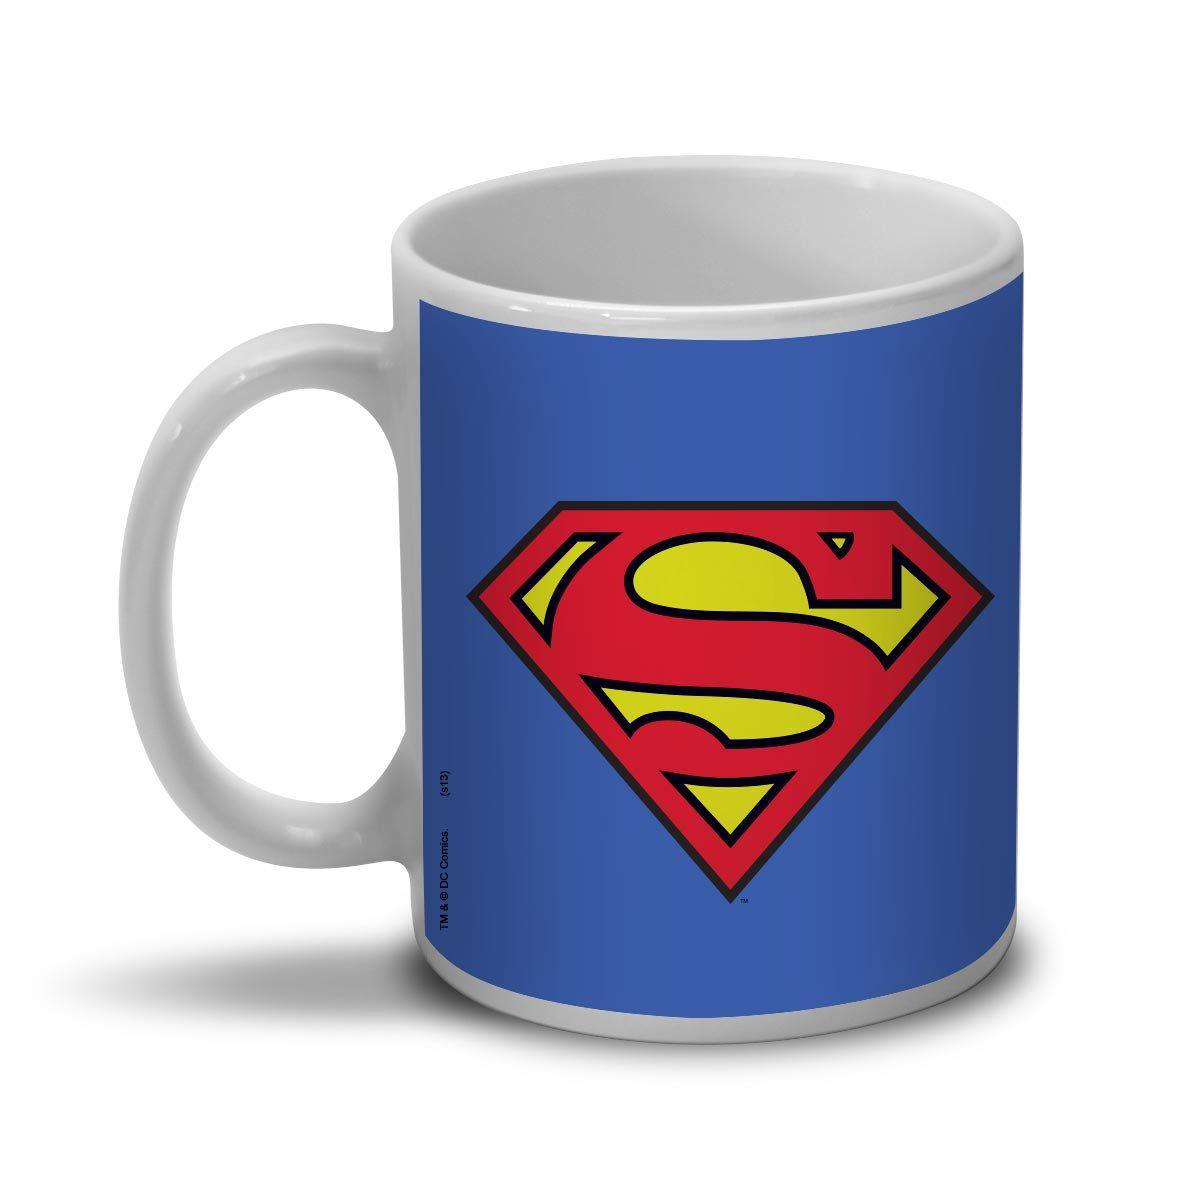 Caneca Superman Logo Superman Oficial  - bandUP Store Marketplace